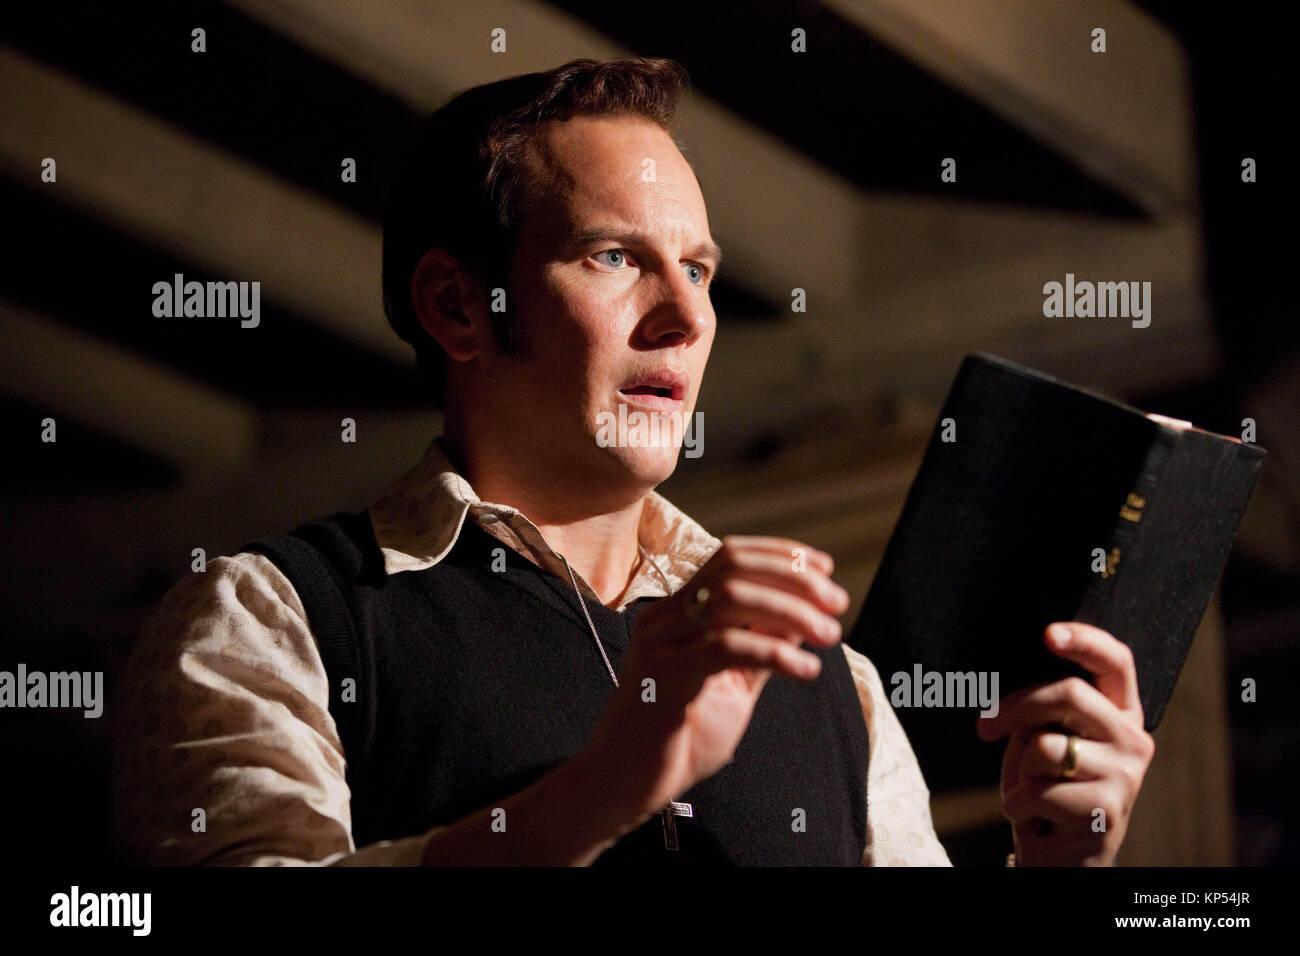 THE CONJURING (2013)  PATRICK WILSON  JAMES WAN (DIR)  NEW LINE CINEMA/MOVIESTORE COLLECTION LTD Stock Photo